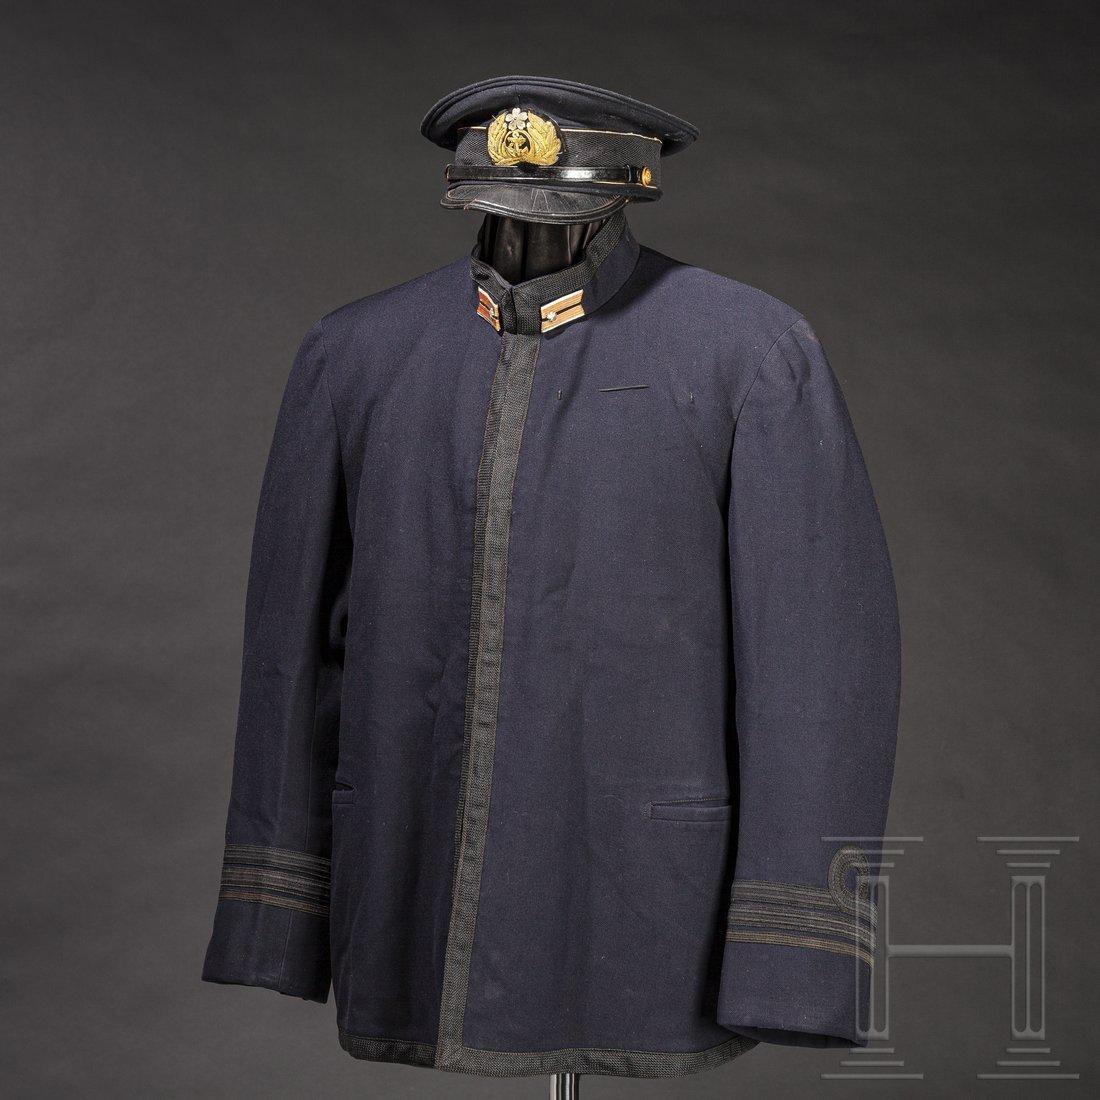 A set comprising uniform and equipment belonging to a